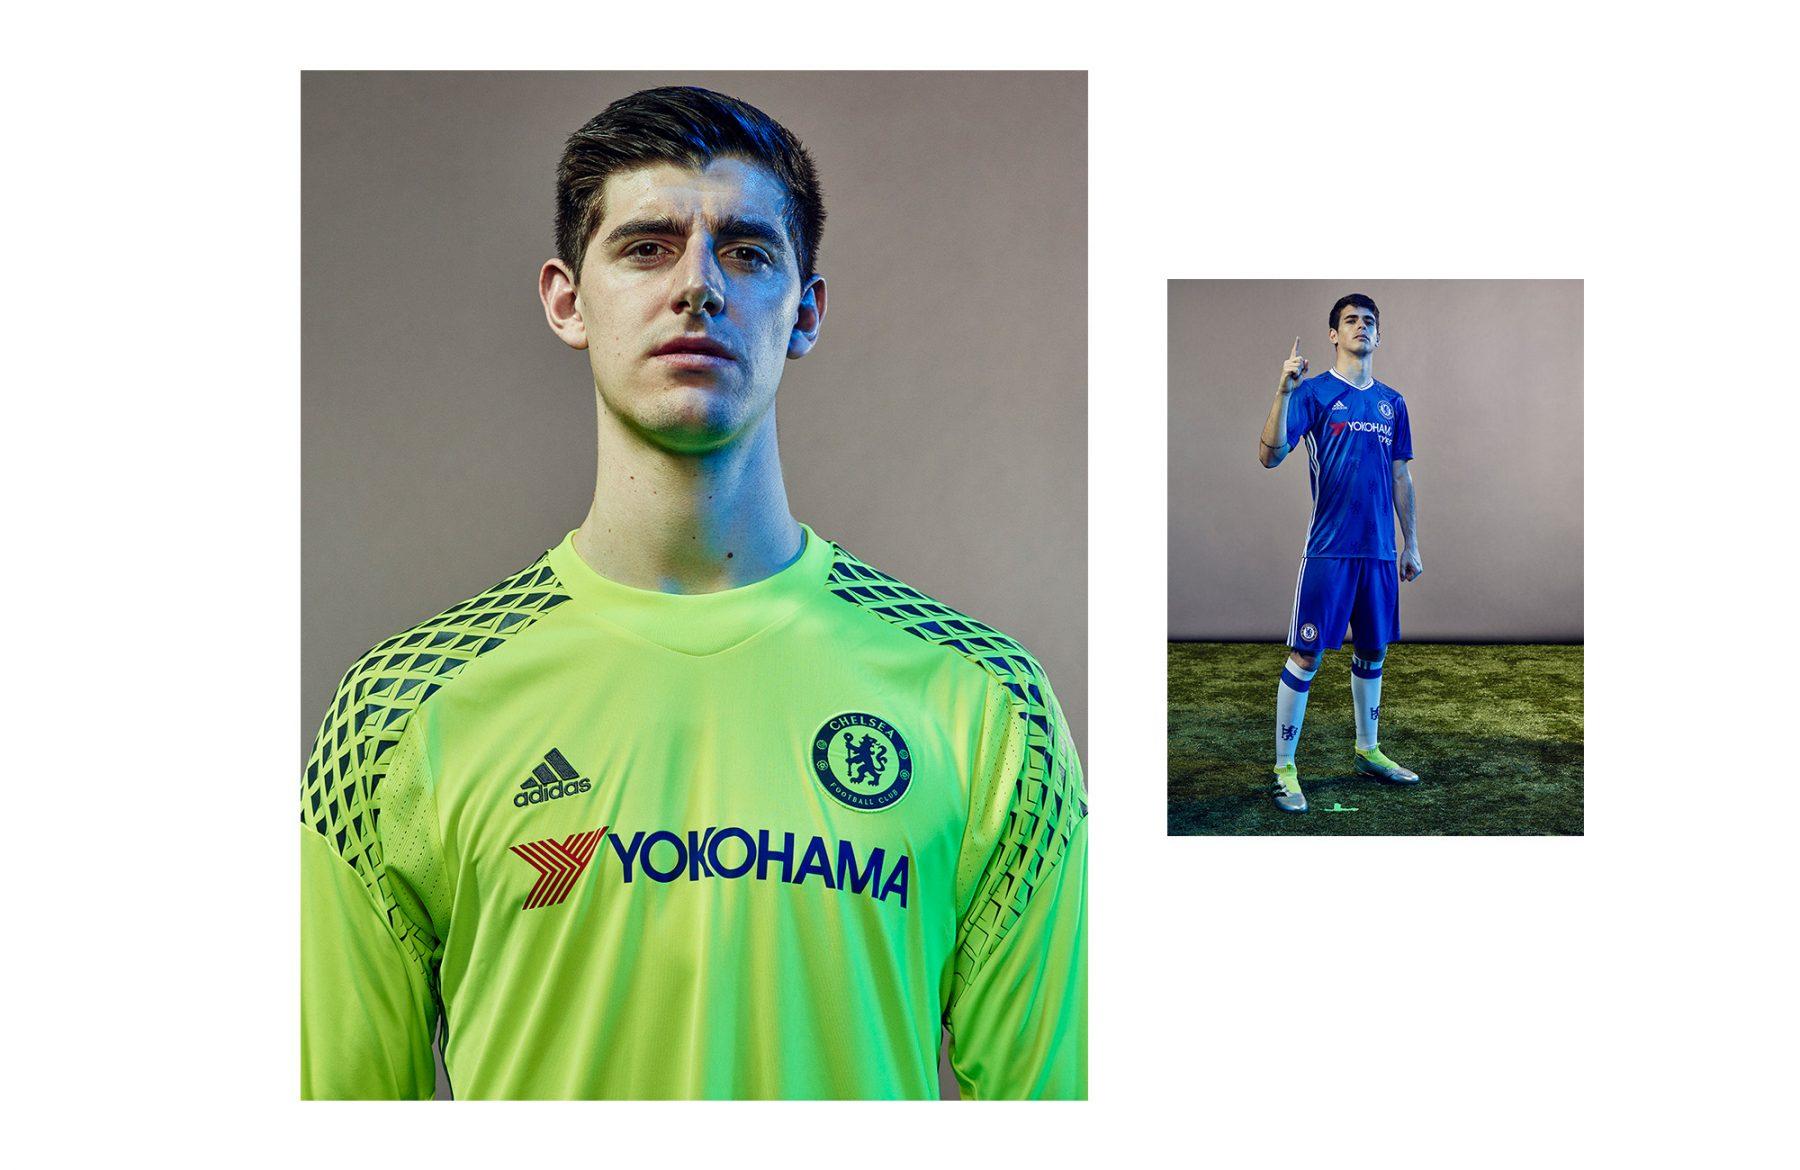 Super Chelsea - 4 of 6